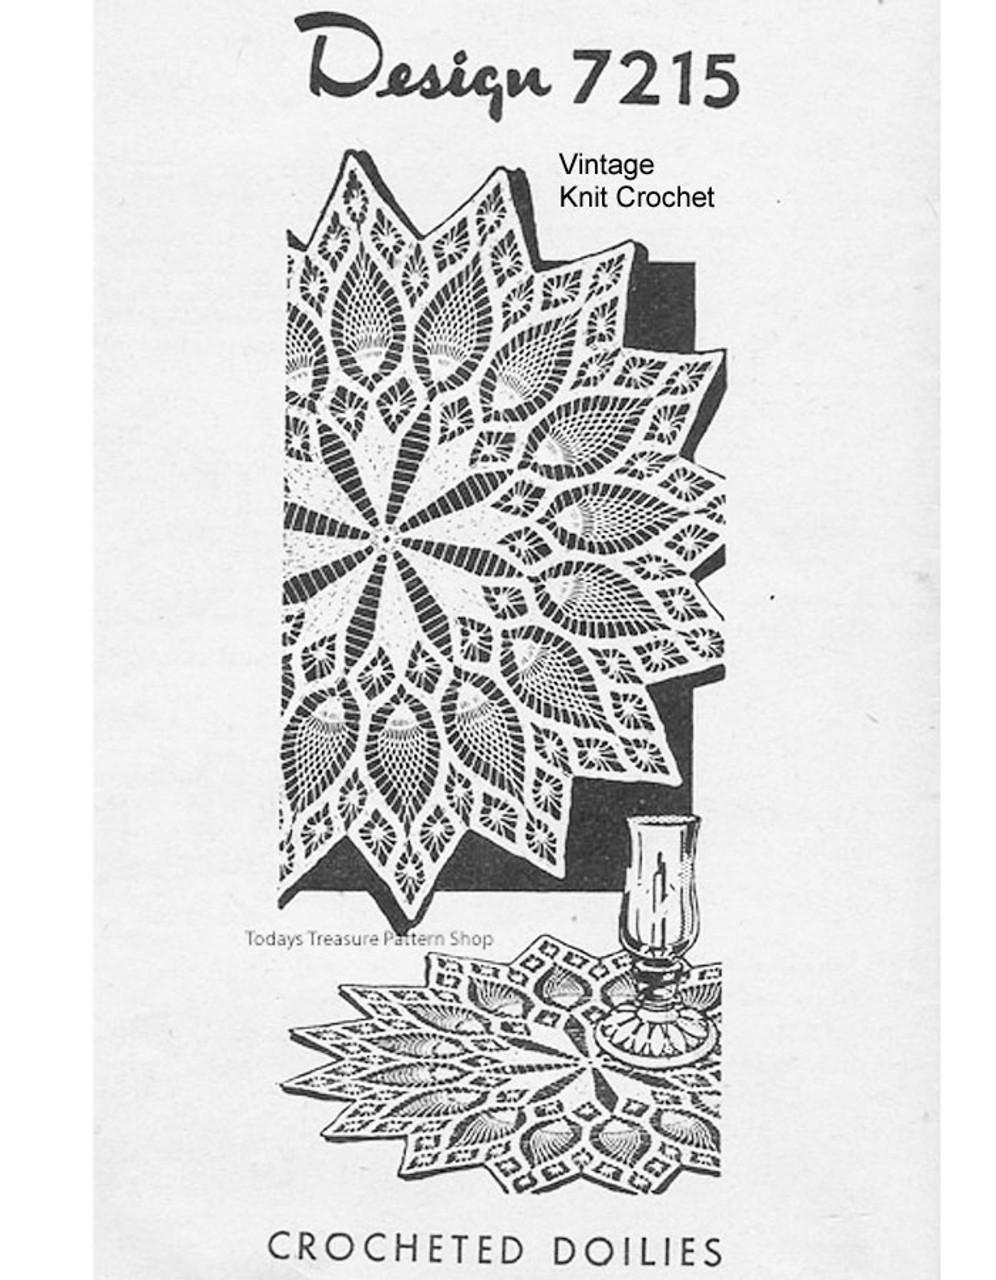 Small Crochet pineapple doily pattern Design 7215